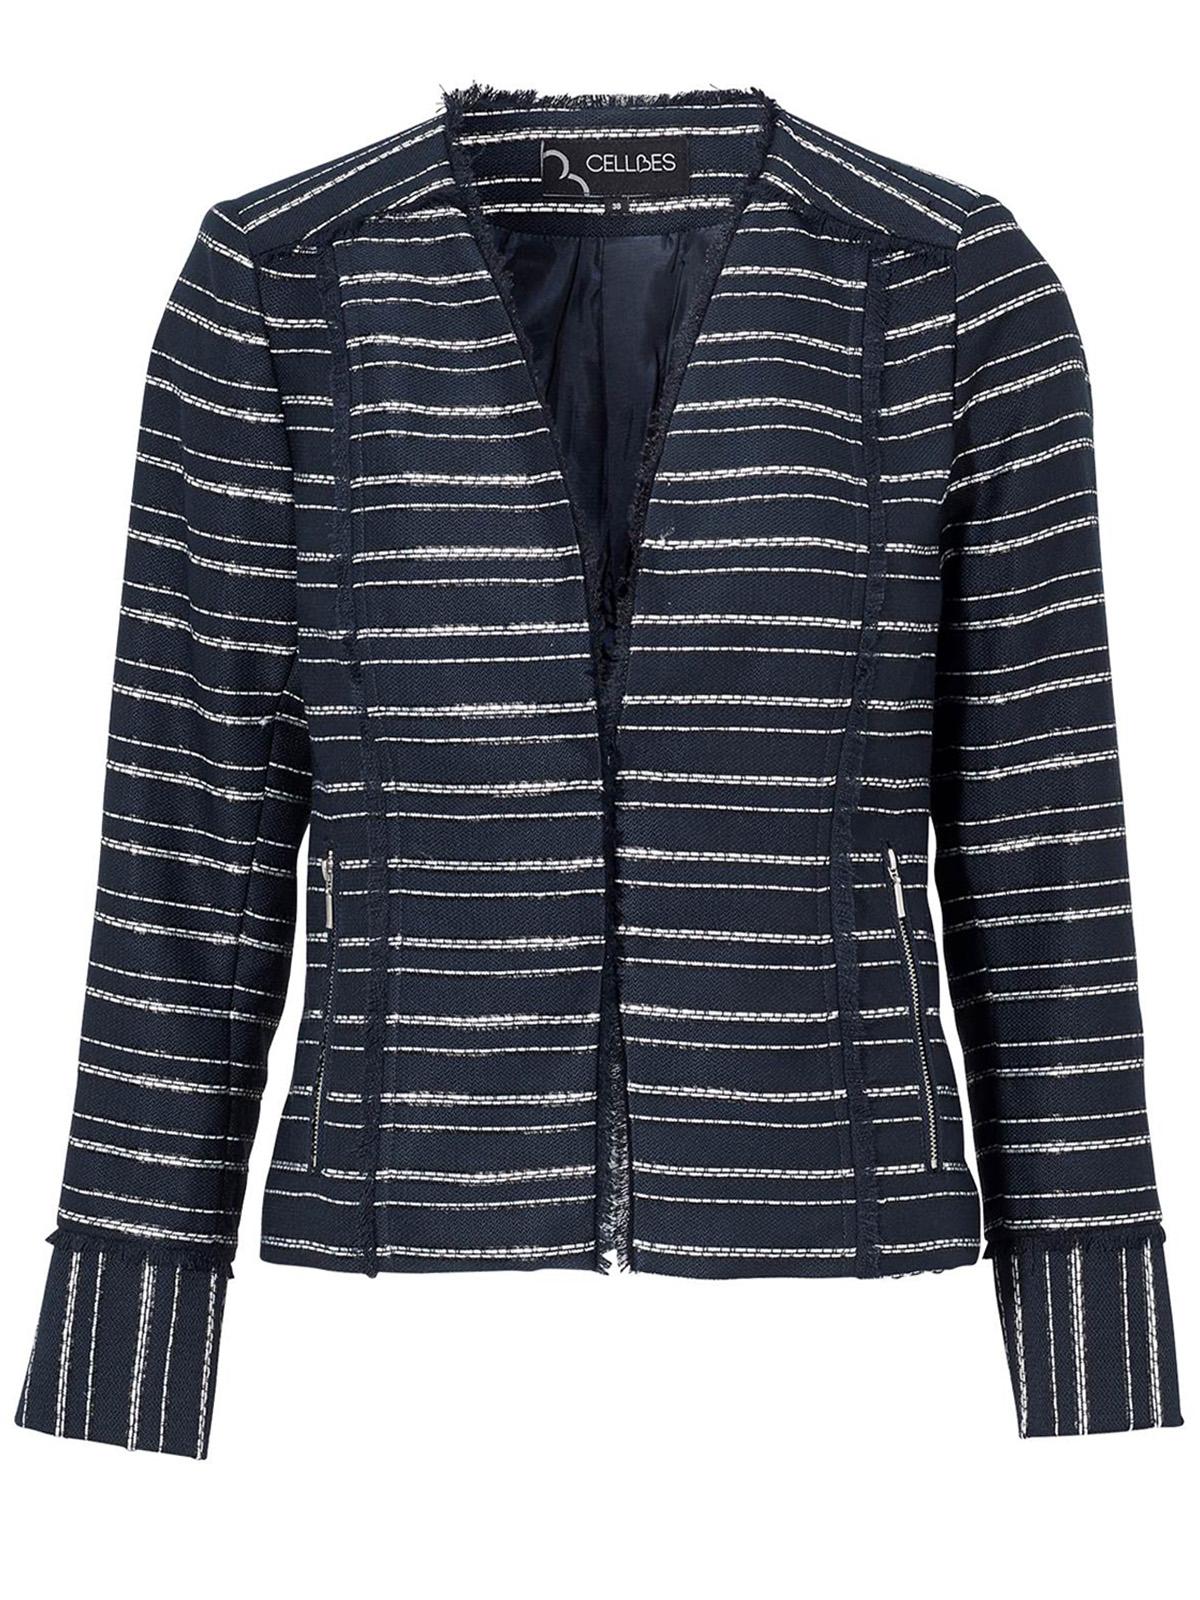 Wholesale Plus Size Clothing Outsize Ladies Clothing By